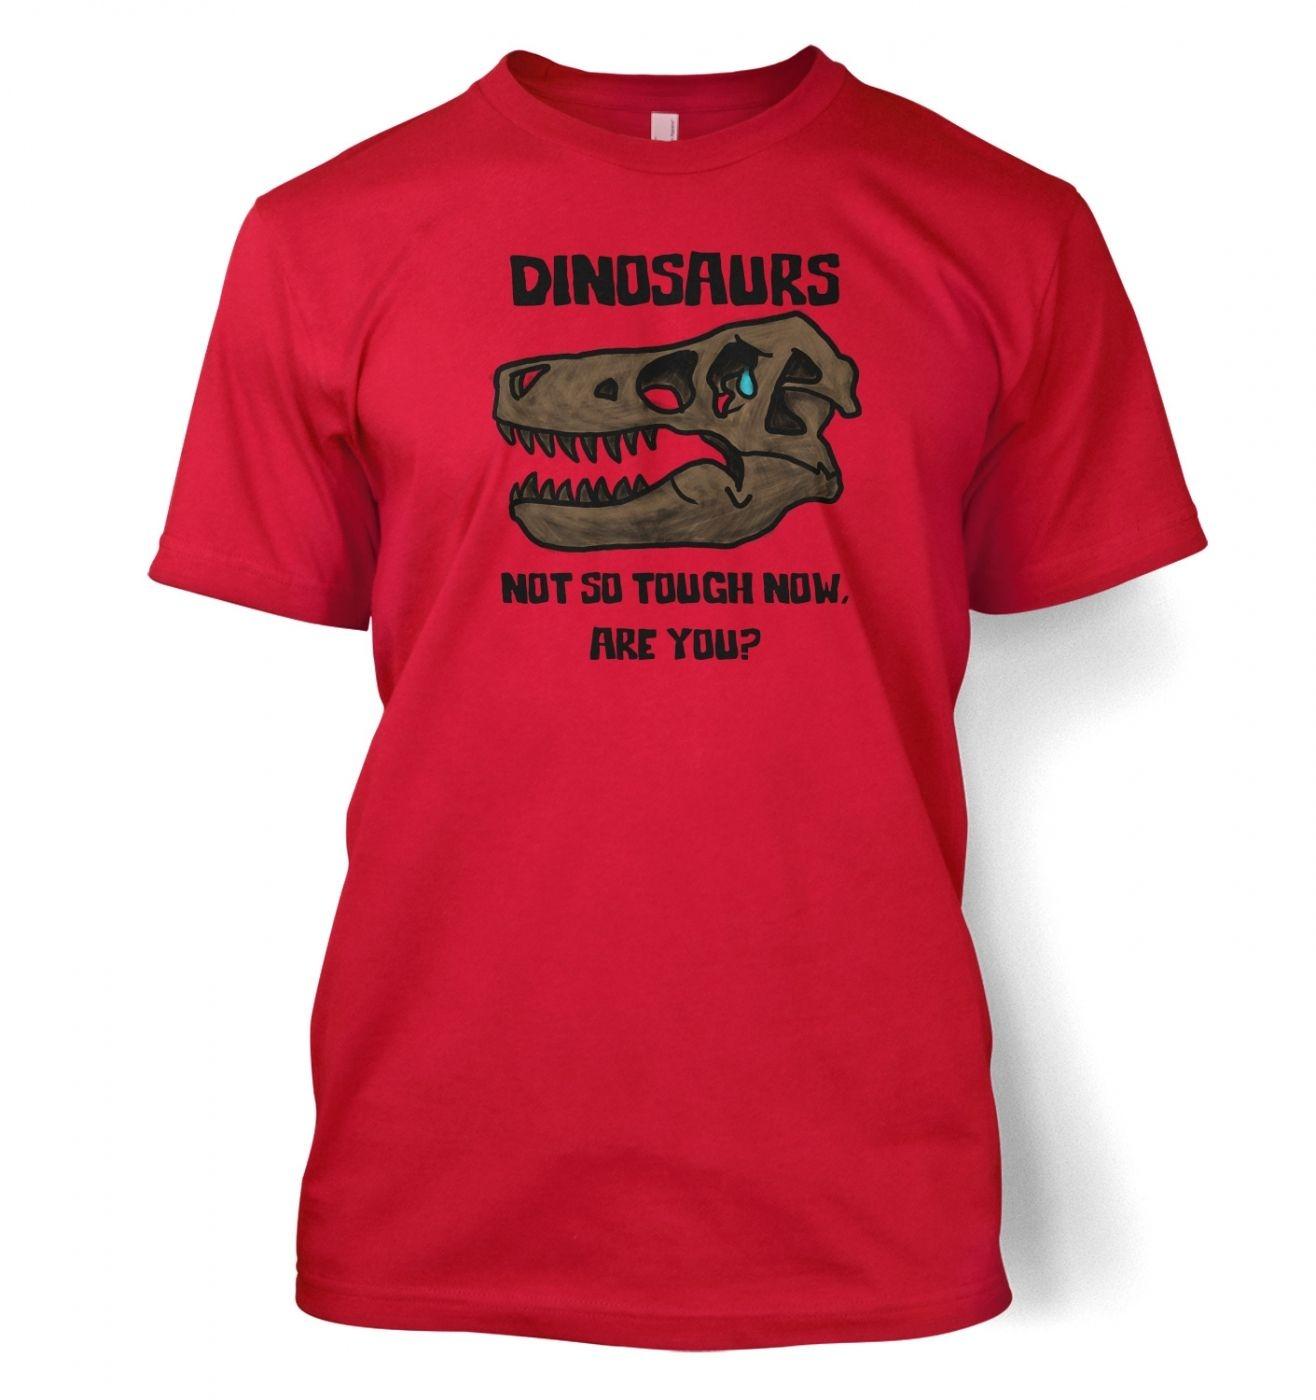 Dinosaurs Not So Tough men's t-shirt